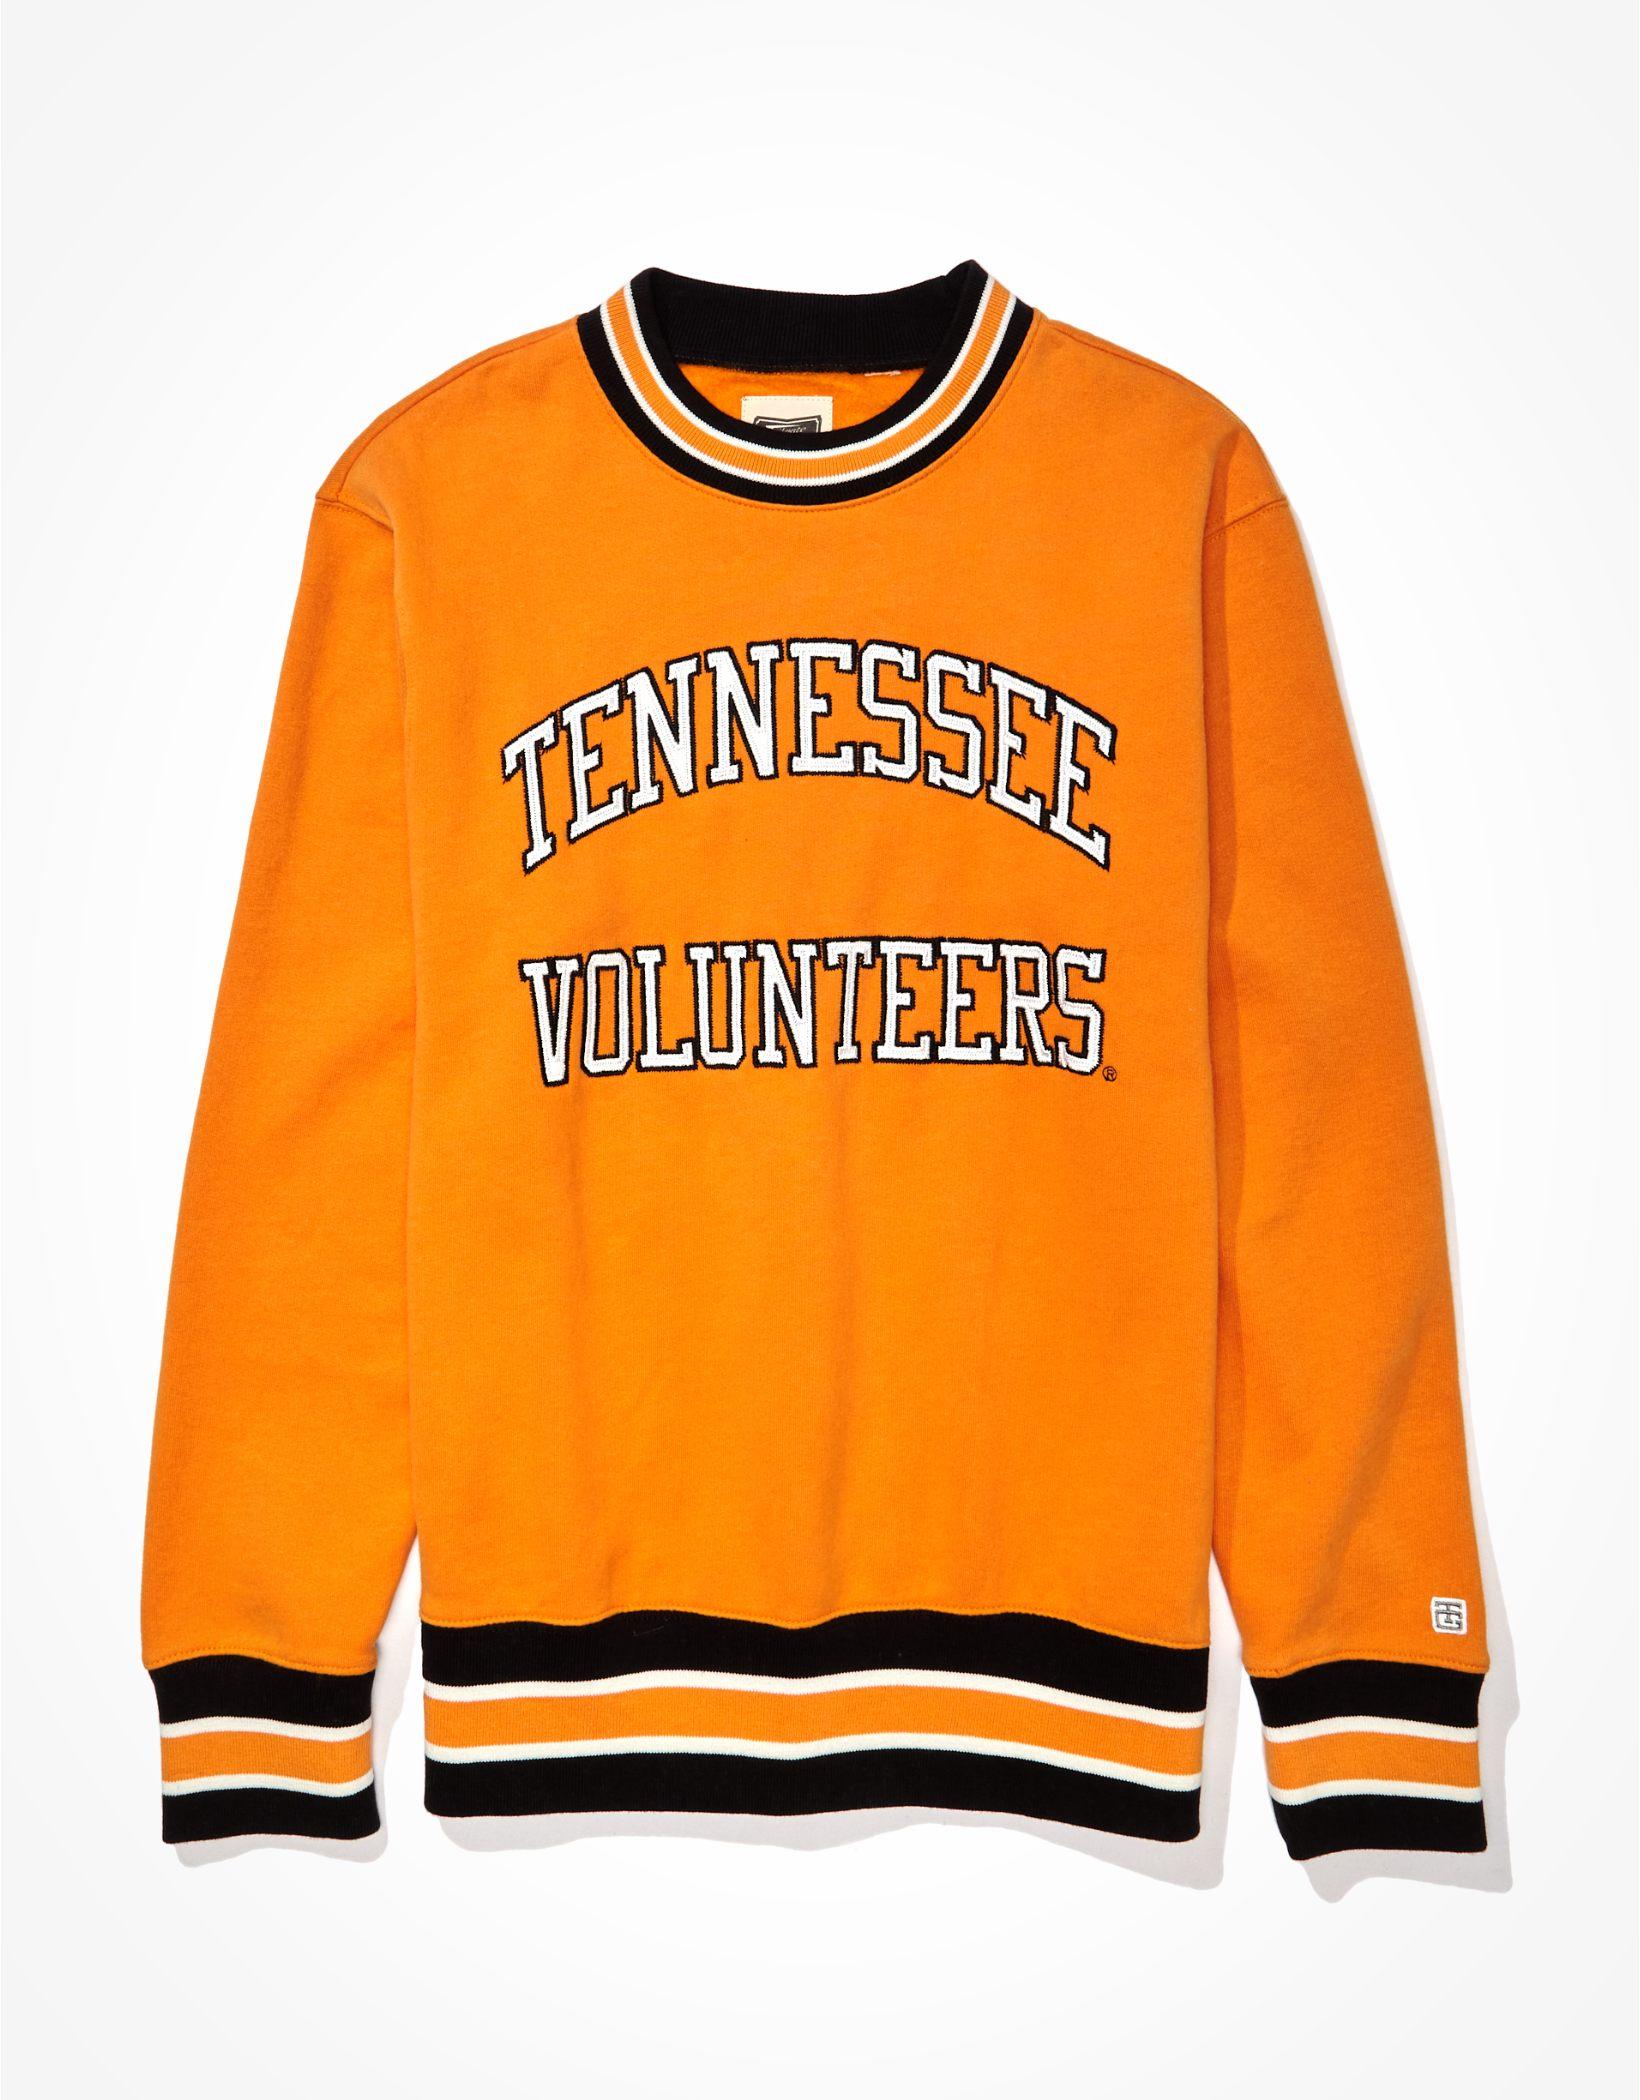 Tailgate Men's Tennessee Vols Tipped Fleece Sweatshirt